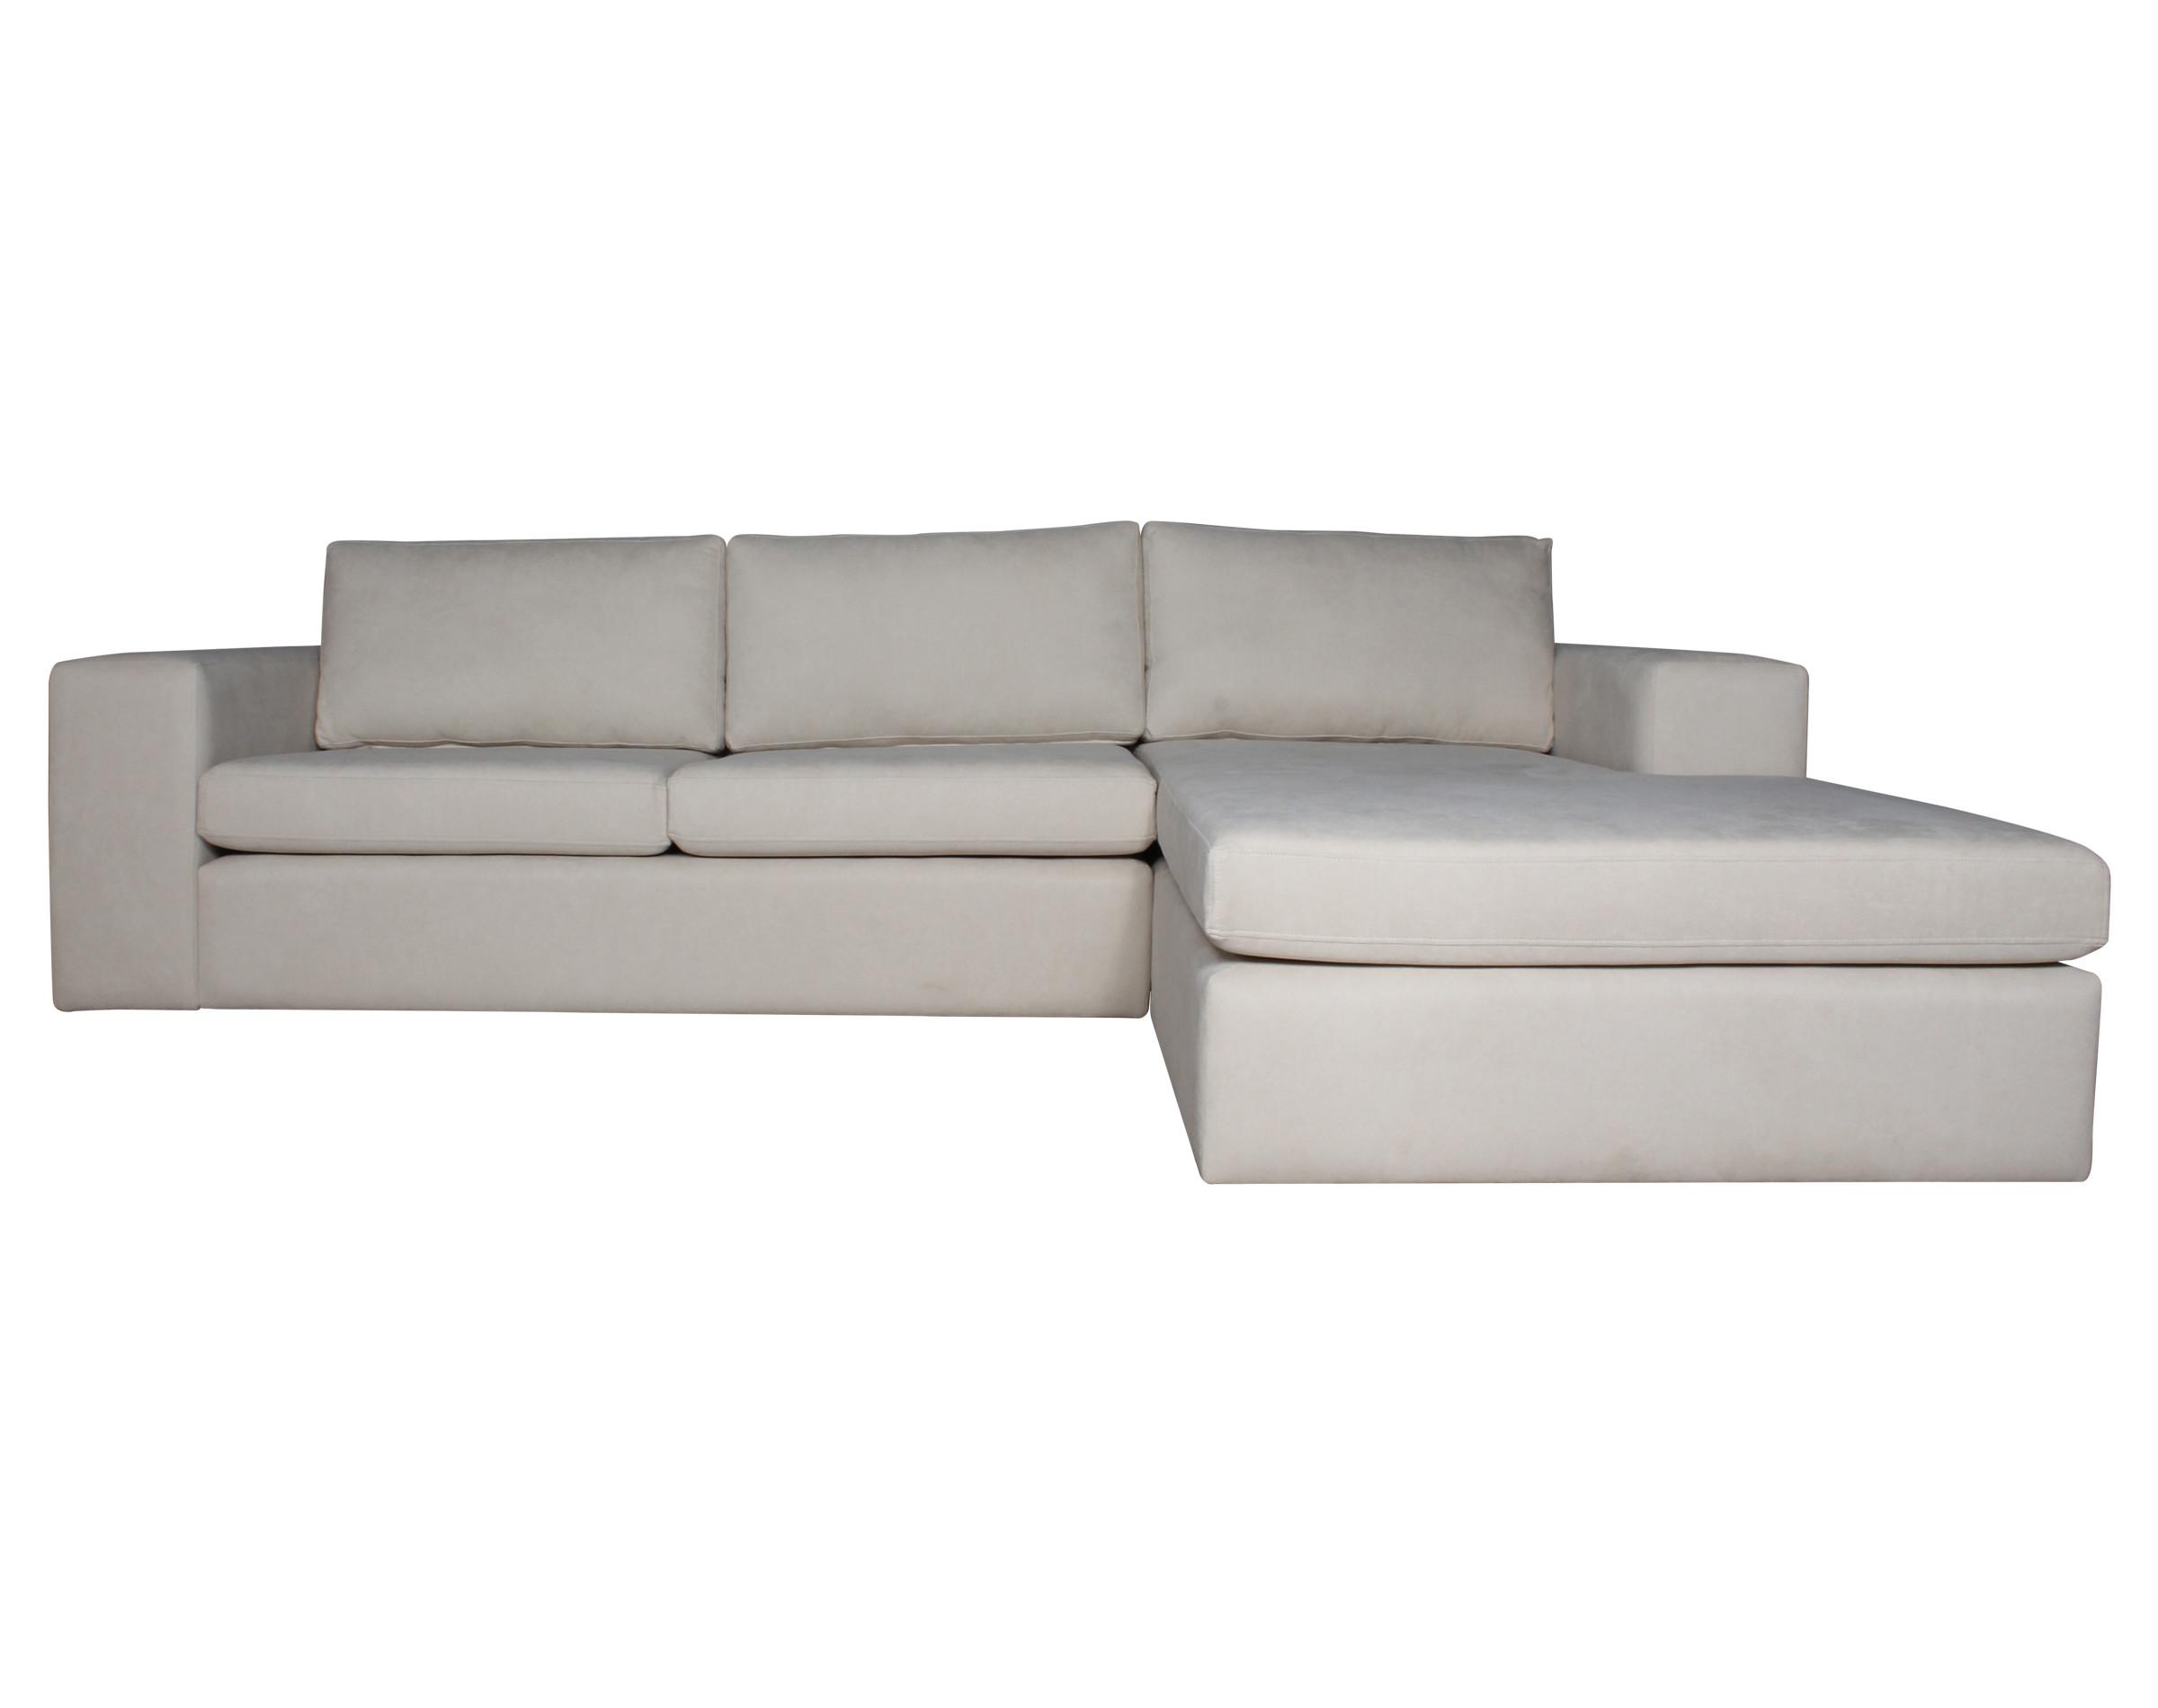 Sofa Seccional Derecho Dresde Arena